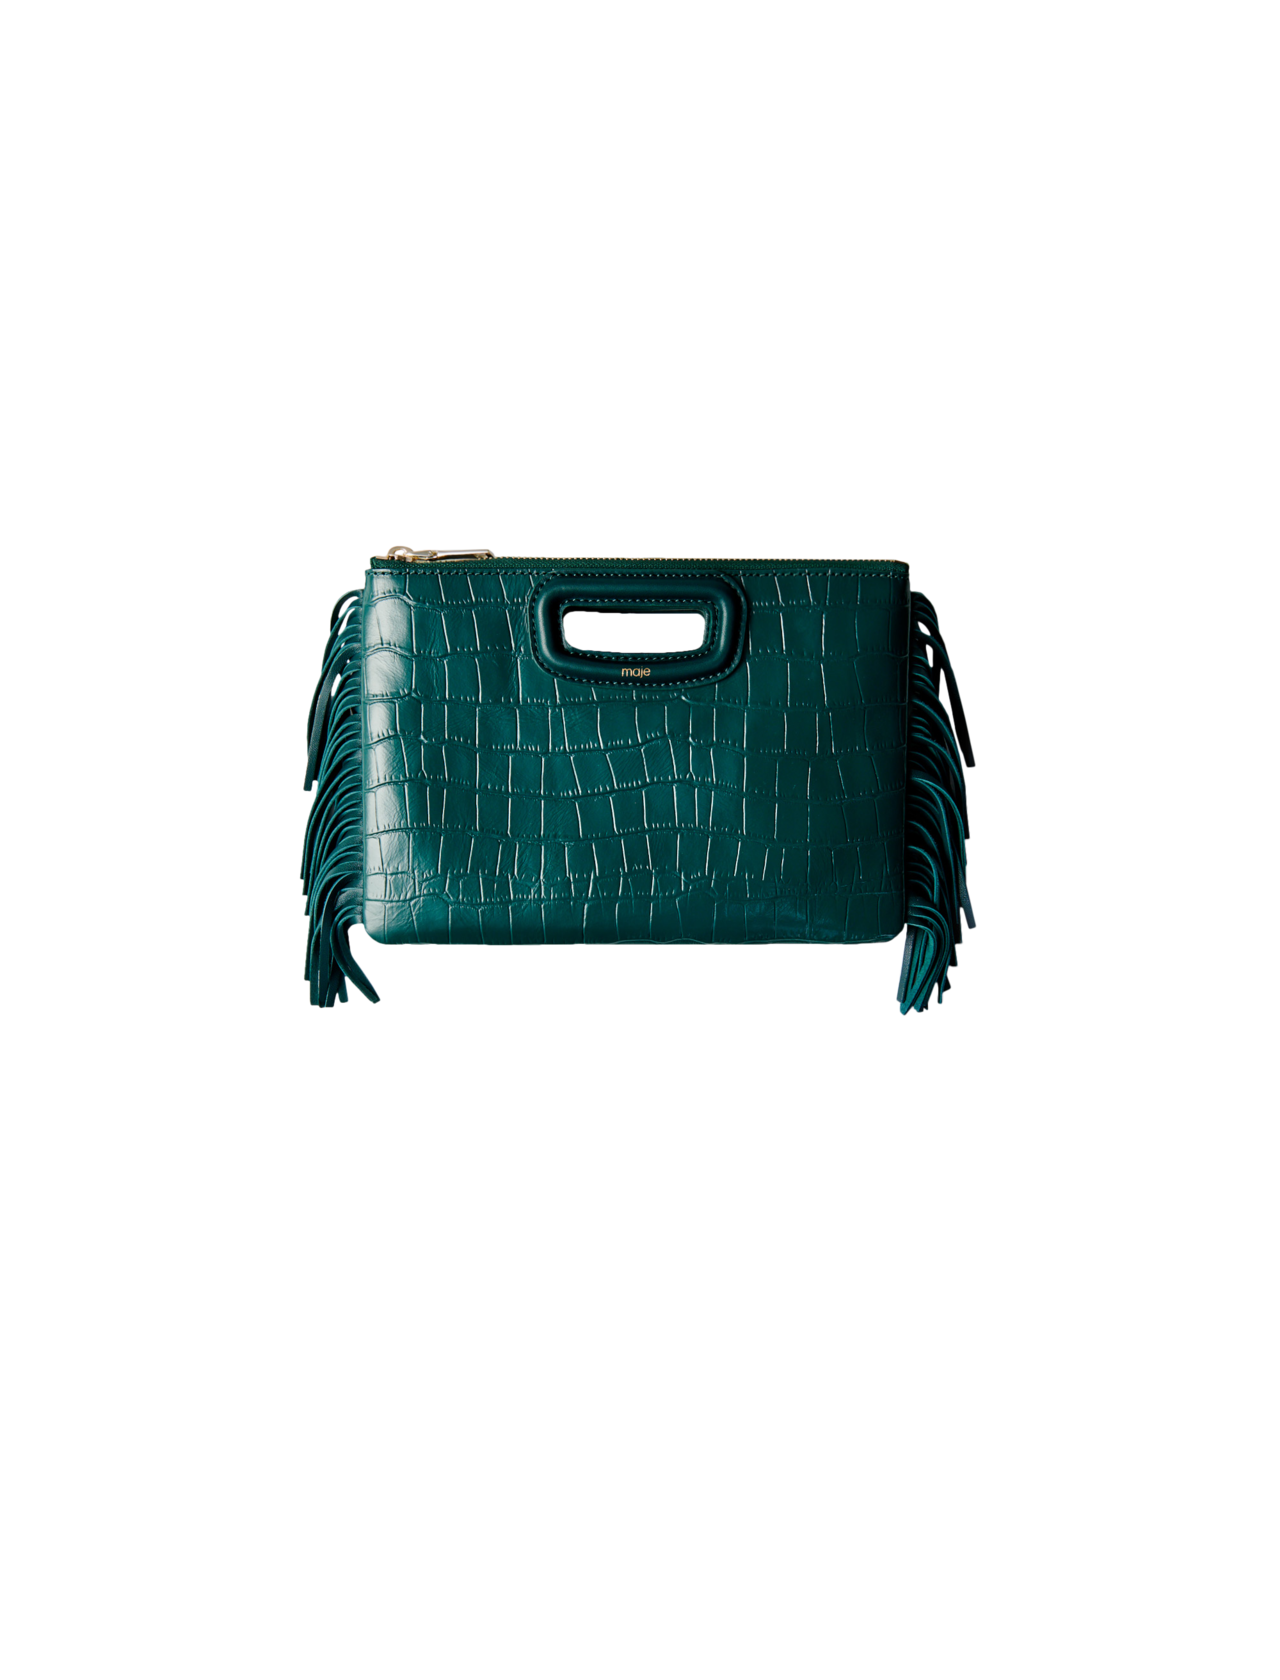 maje綠色鱷魚皮長型流蘇手拿包,售價12,750元。圖/maje提供